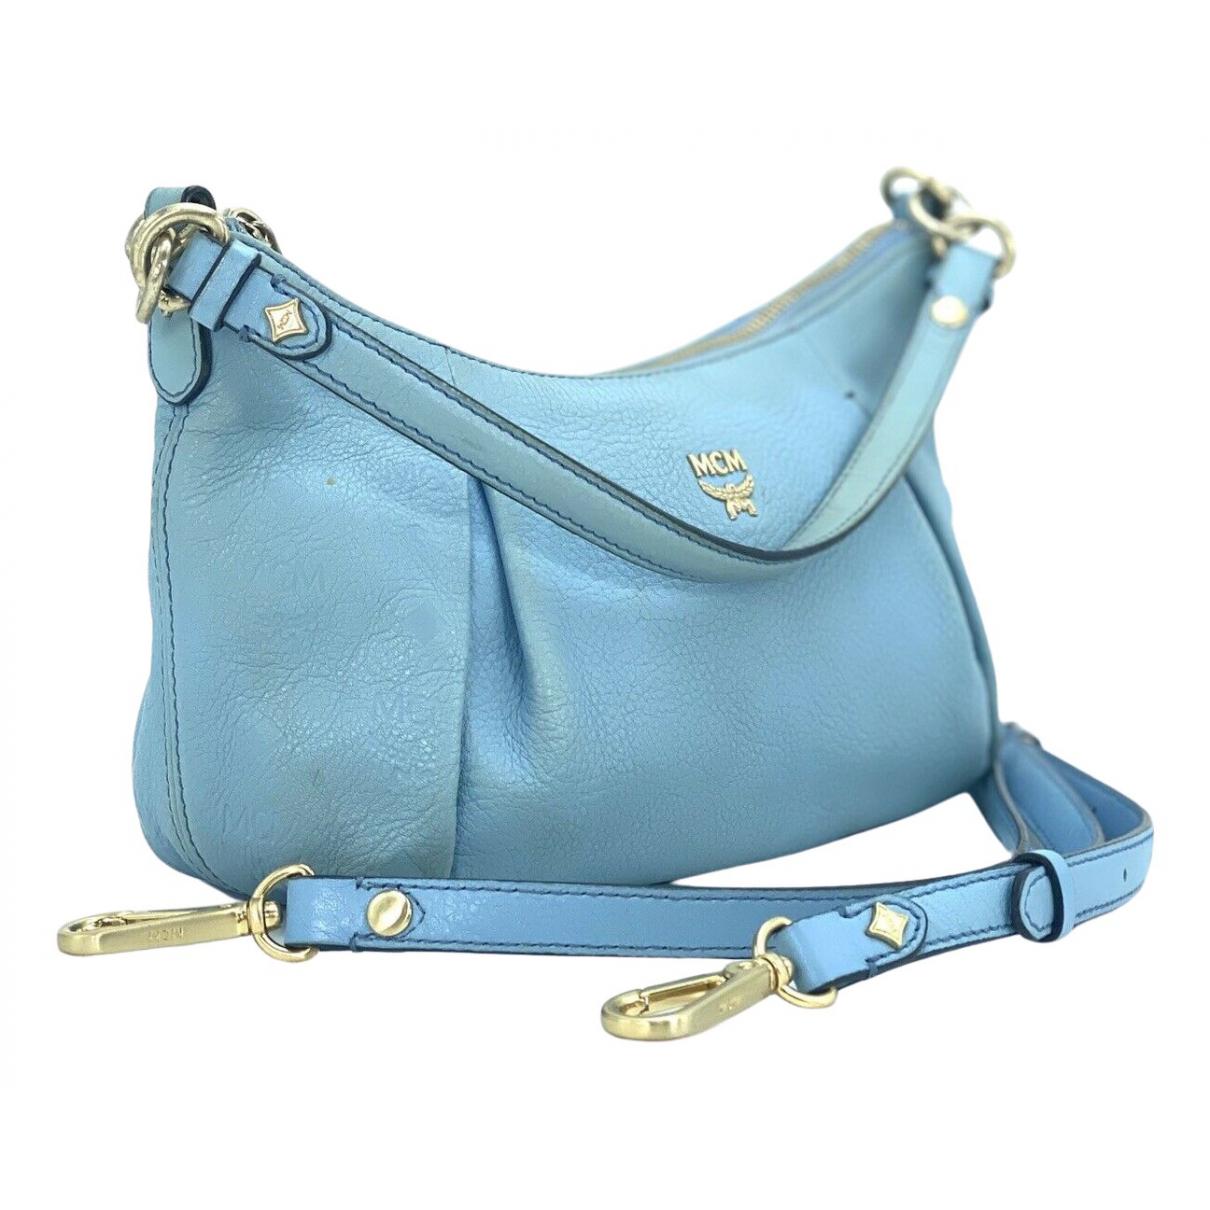 Mcm \N Blue Leather handbag for Women \N